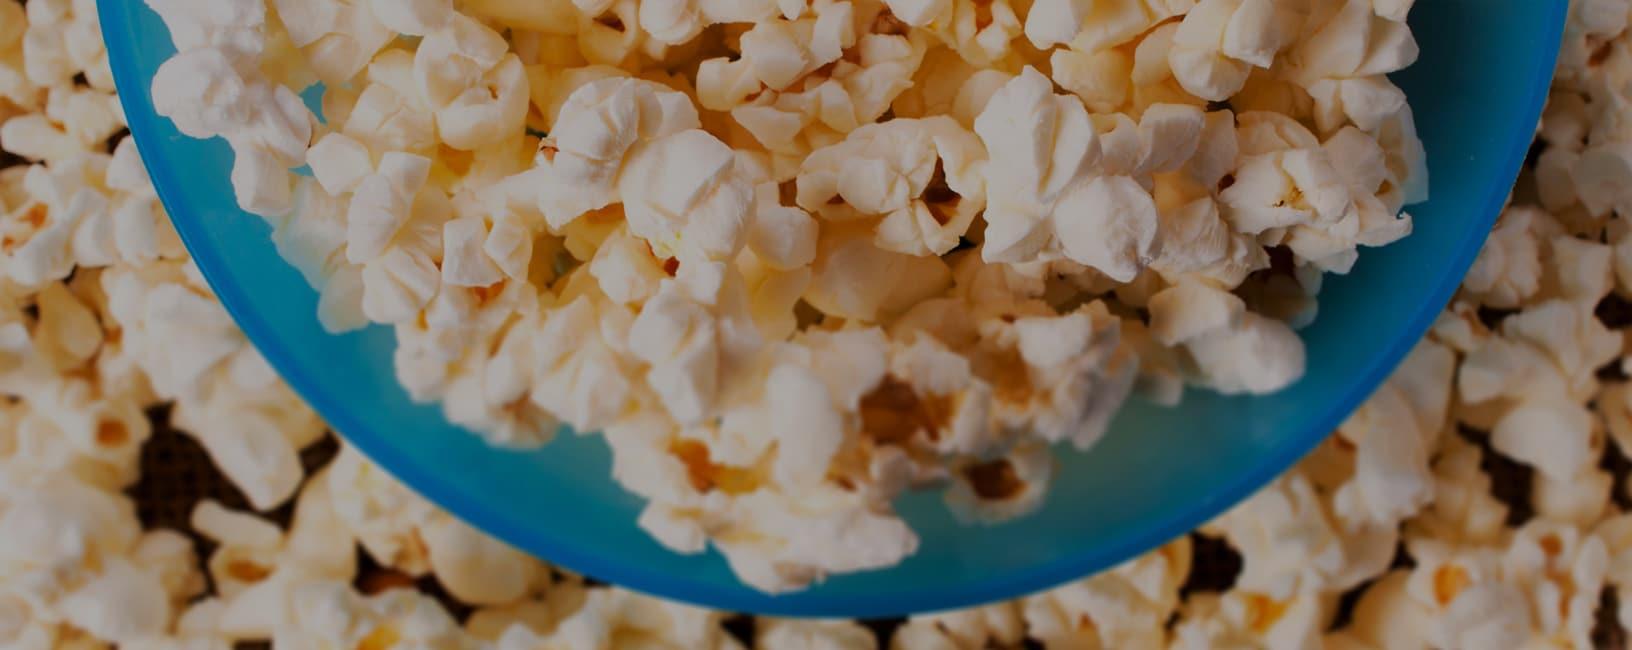 popcorn slide